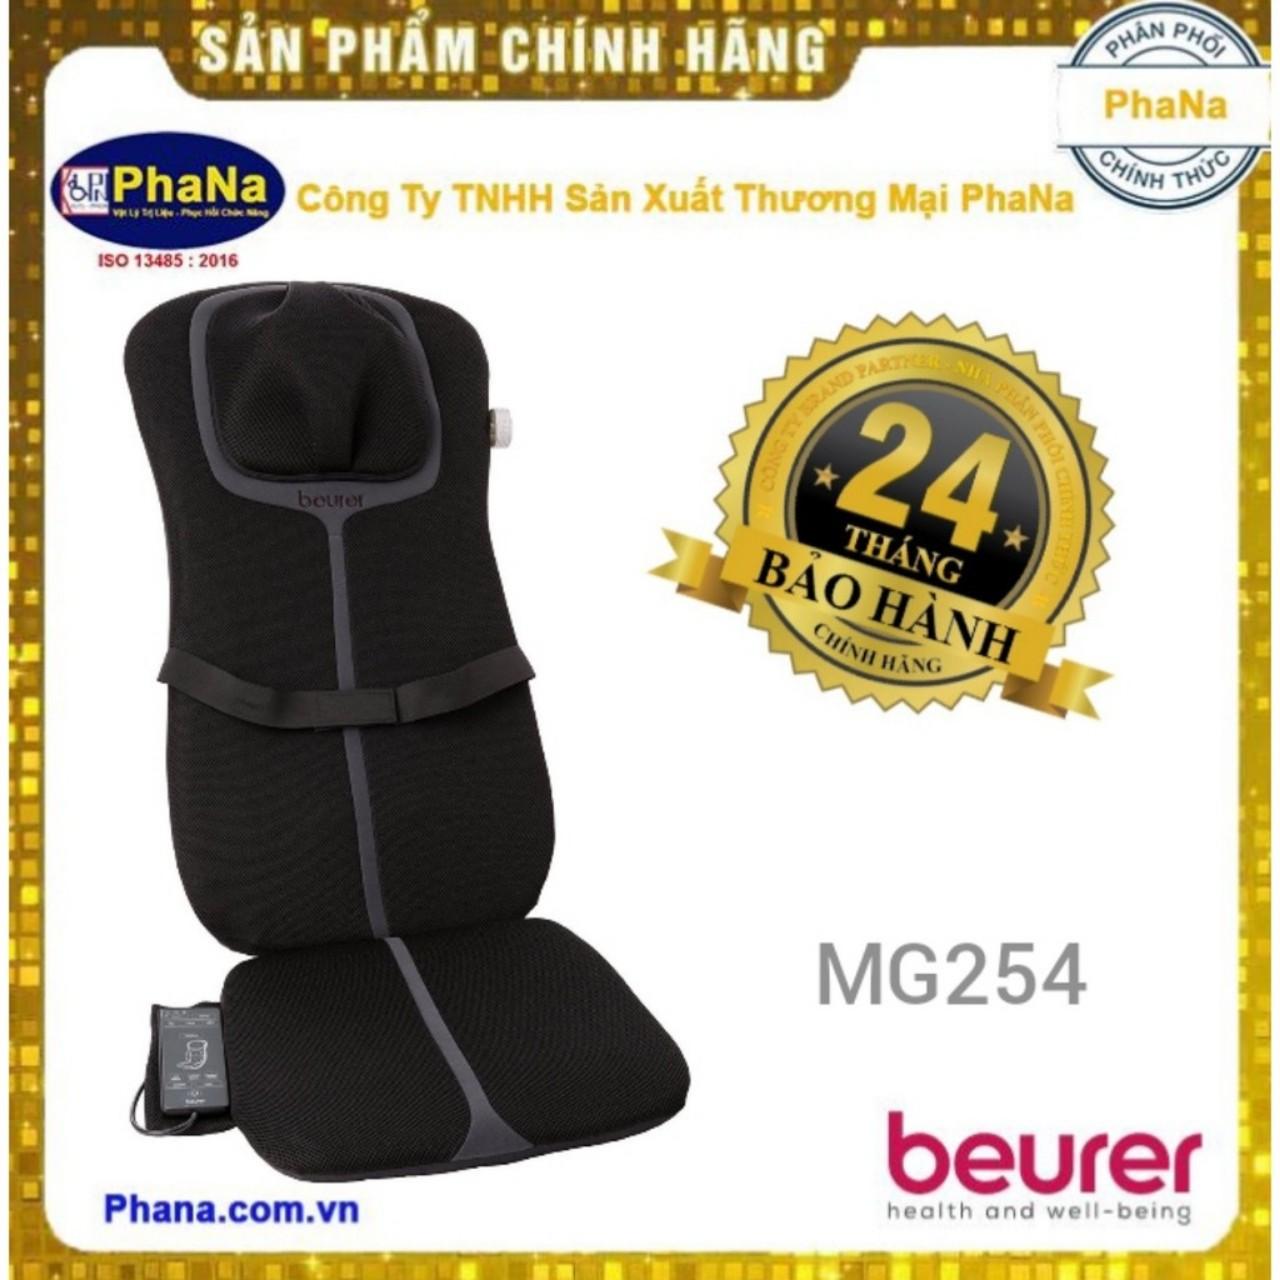 ĐỆM GHẾ MASSAGE LƯNG CỔ, CỘT SỐNG BEURER MG254